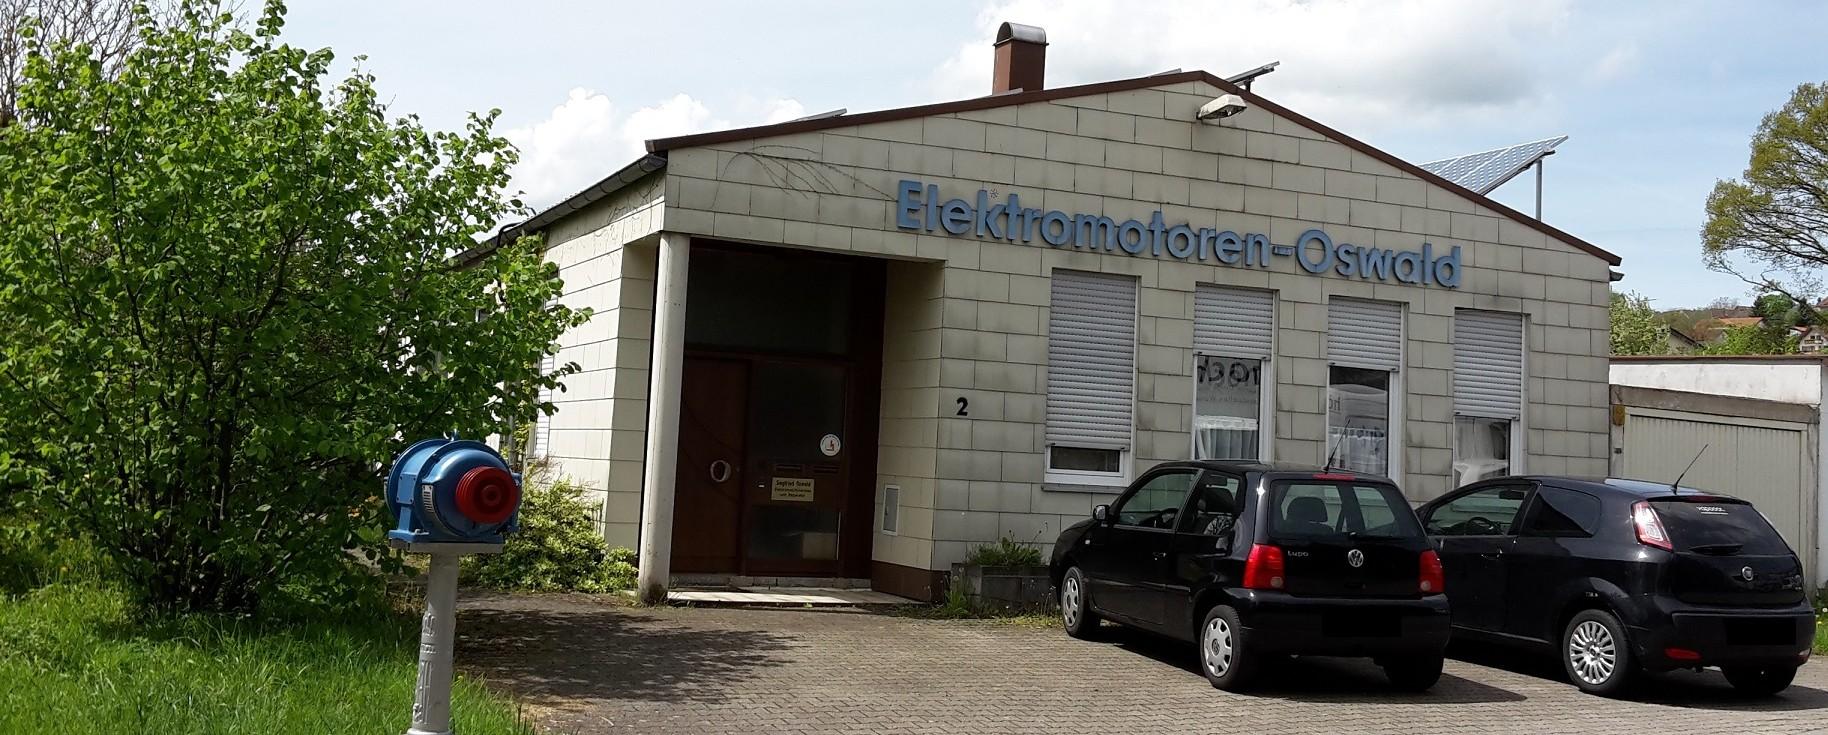 Elektromotoren Oswald GmbH